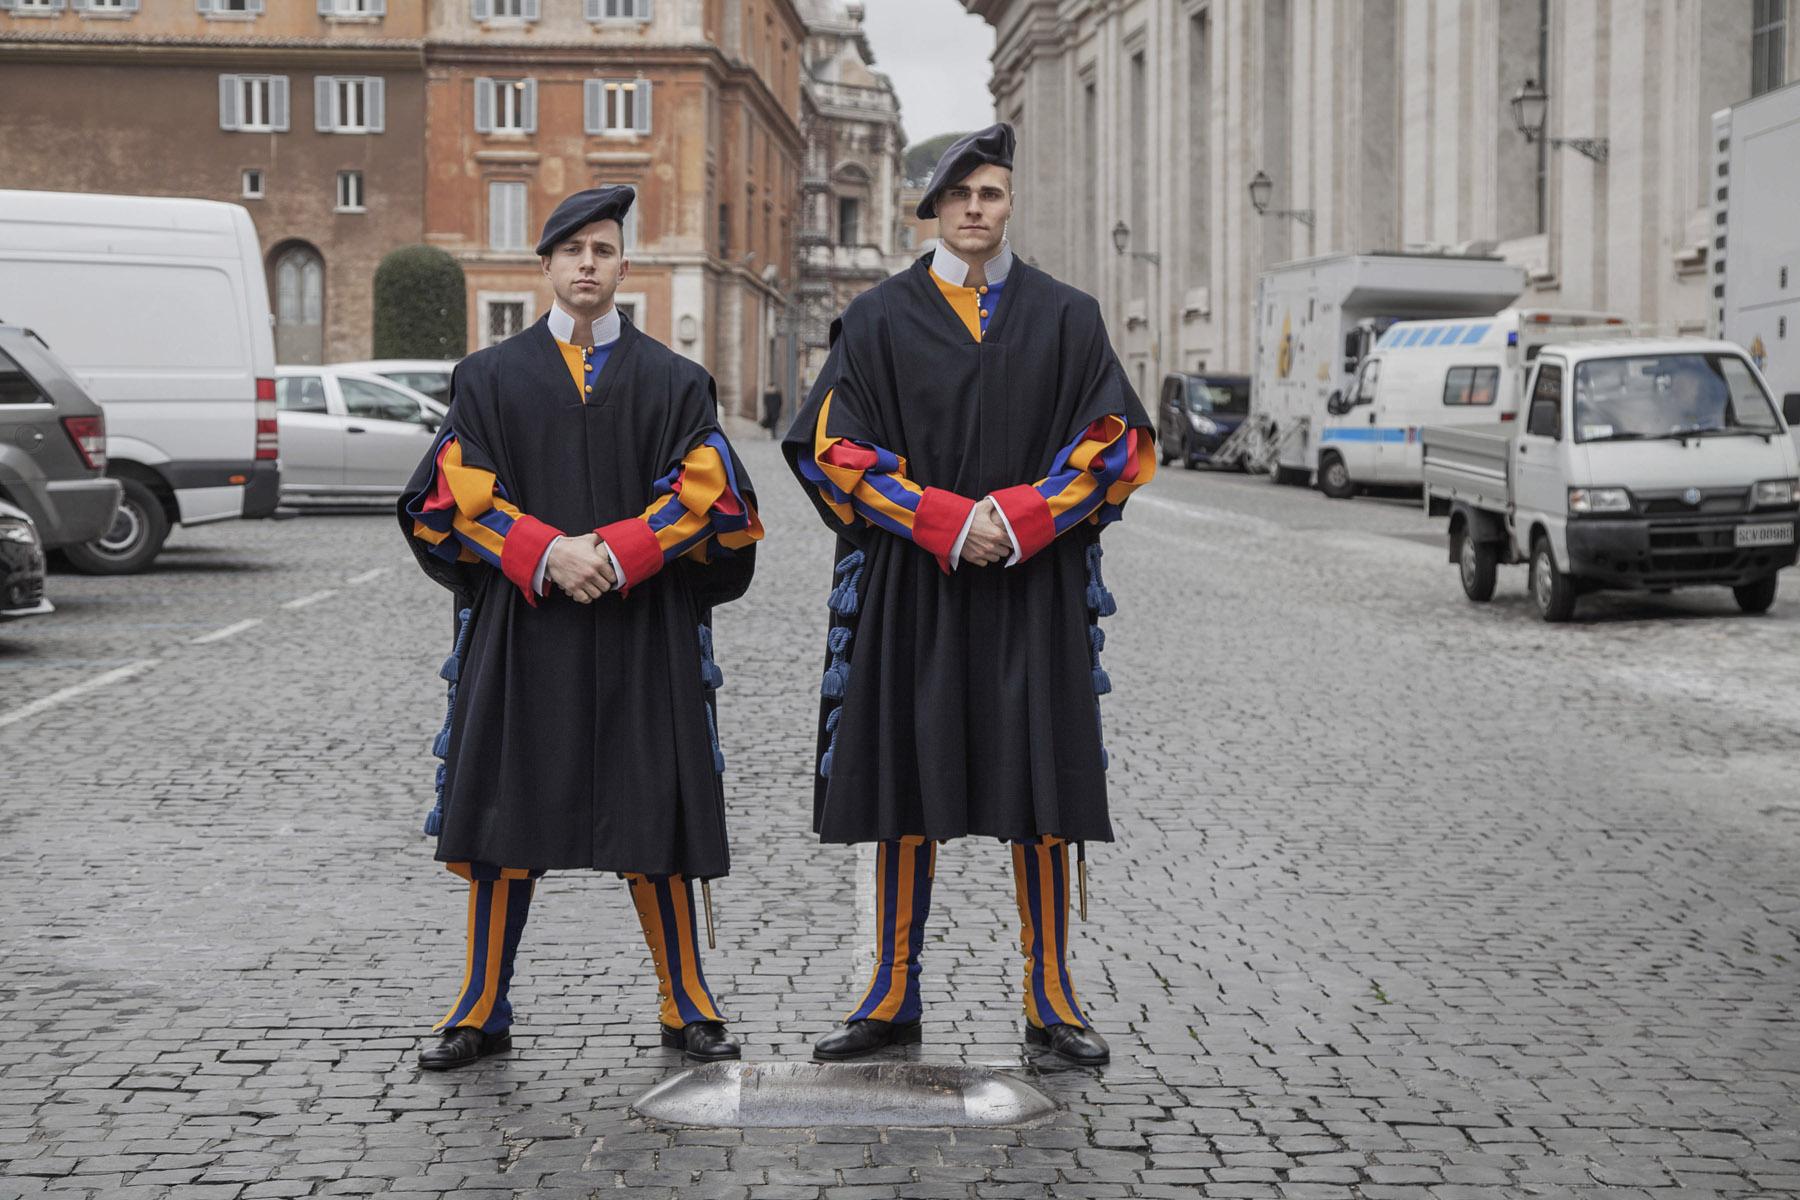 Chiara Spaghetti Kurtovic Popes Two 22